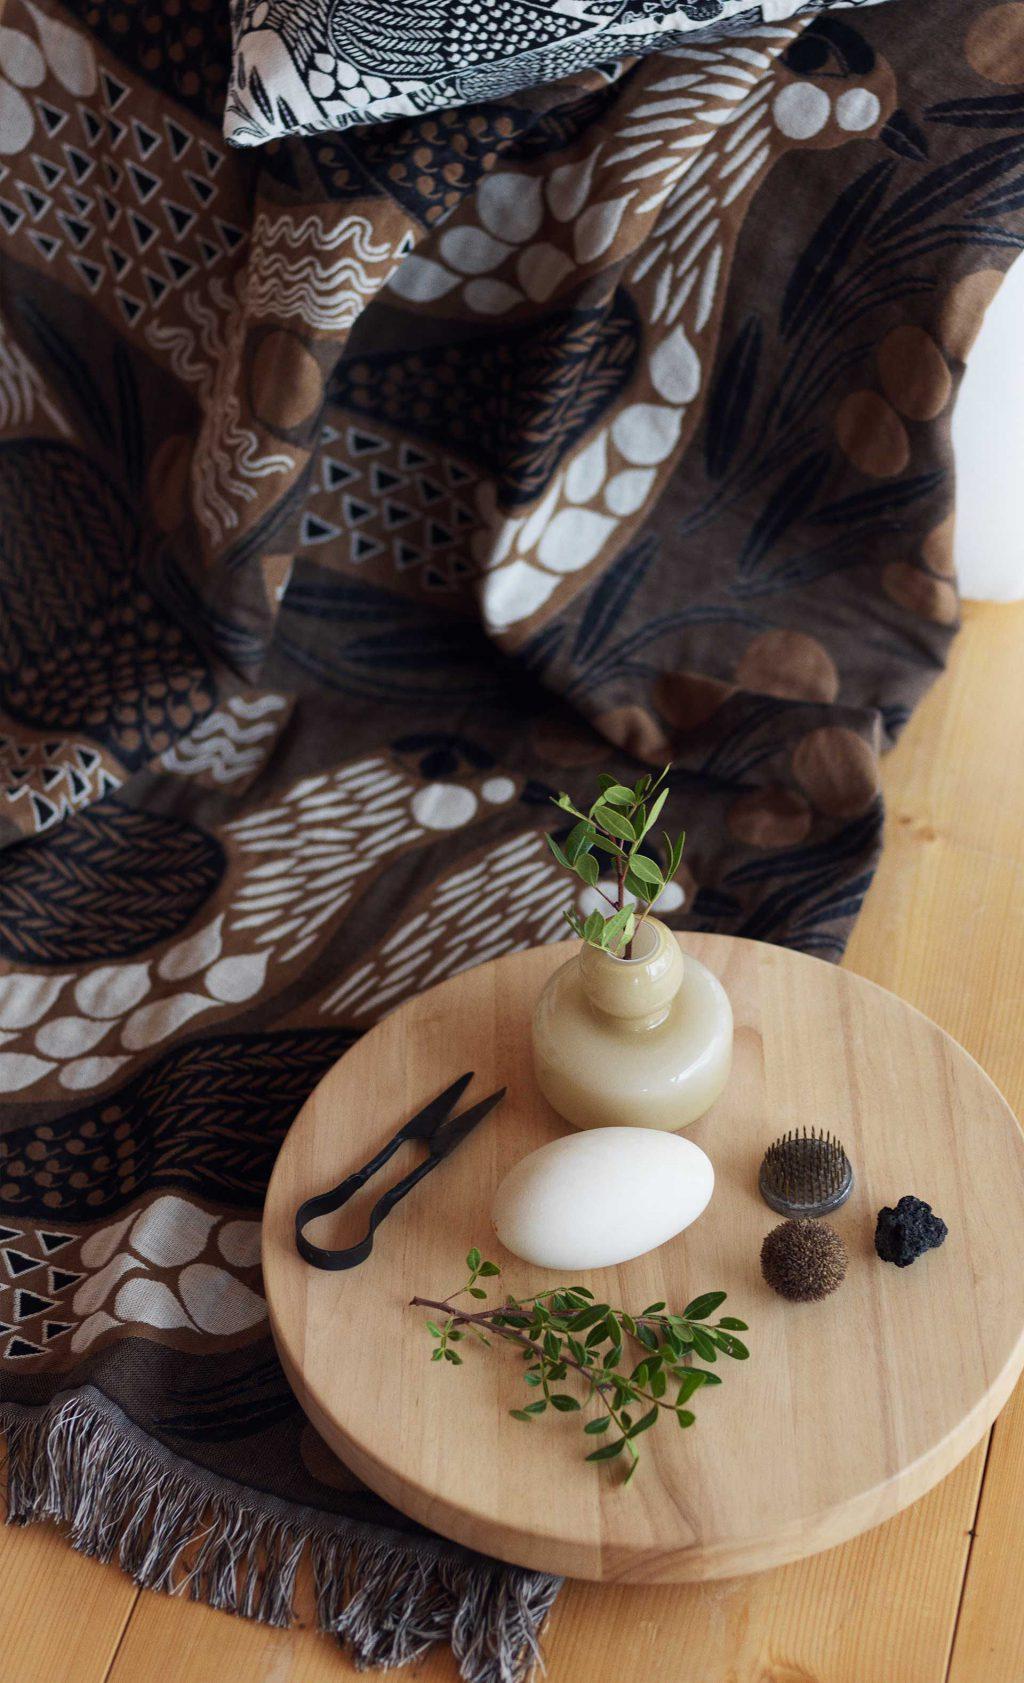 Marimekko for Marimekko by Susanna Vento